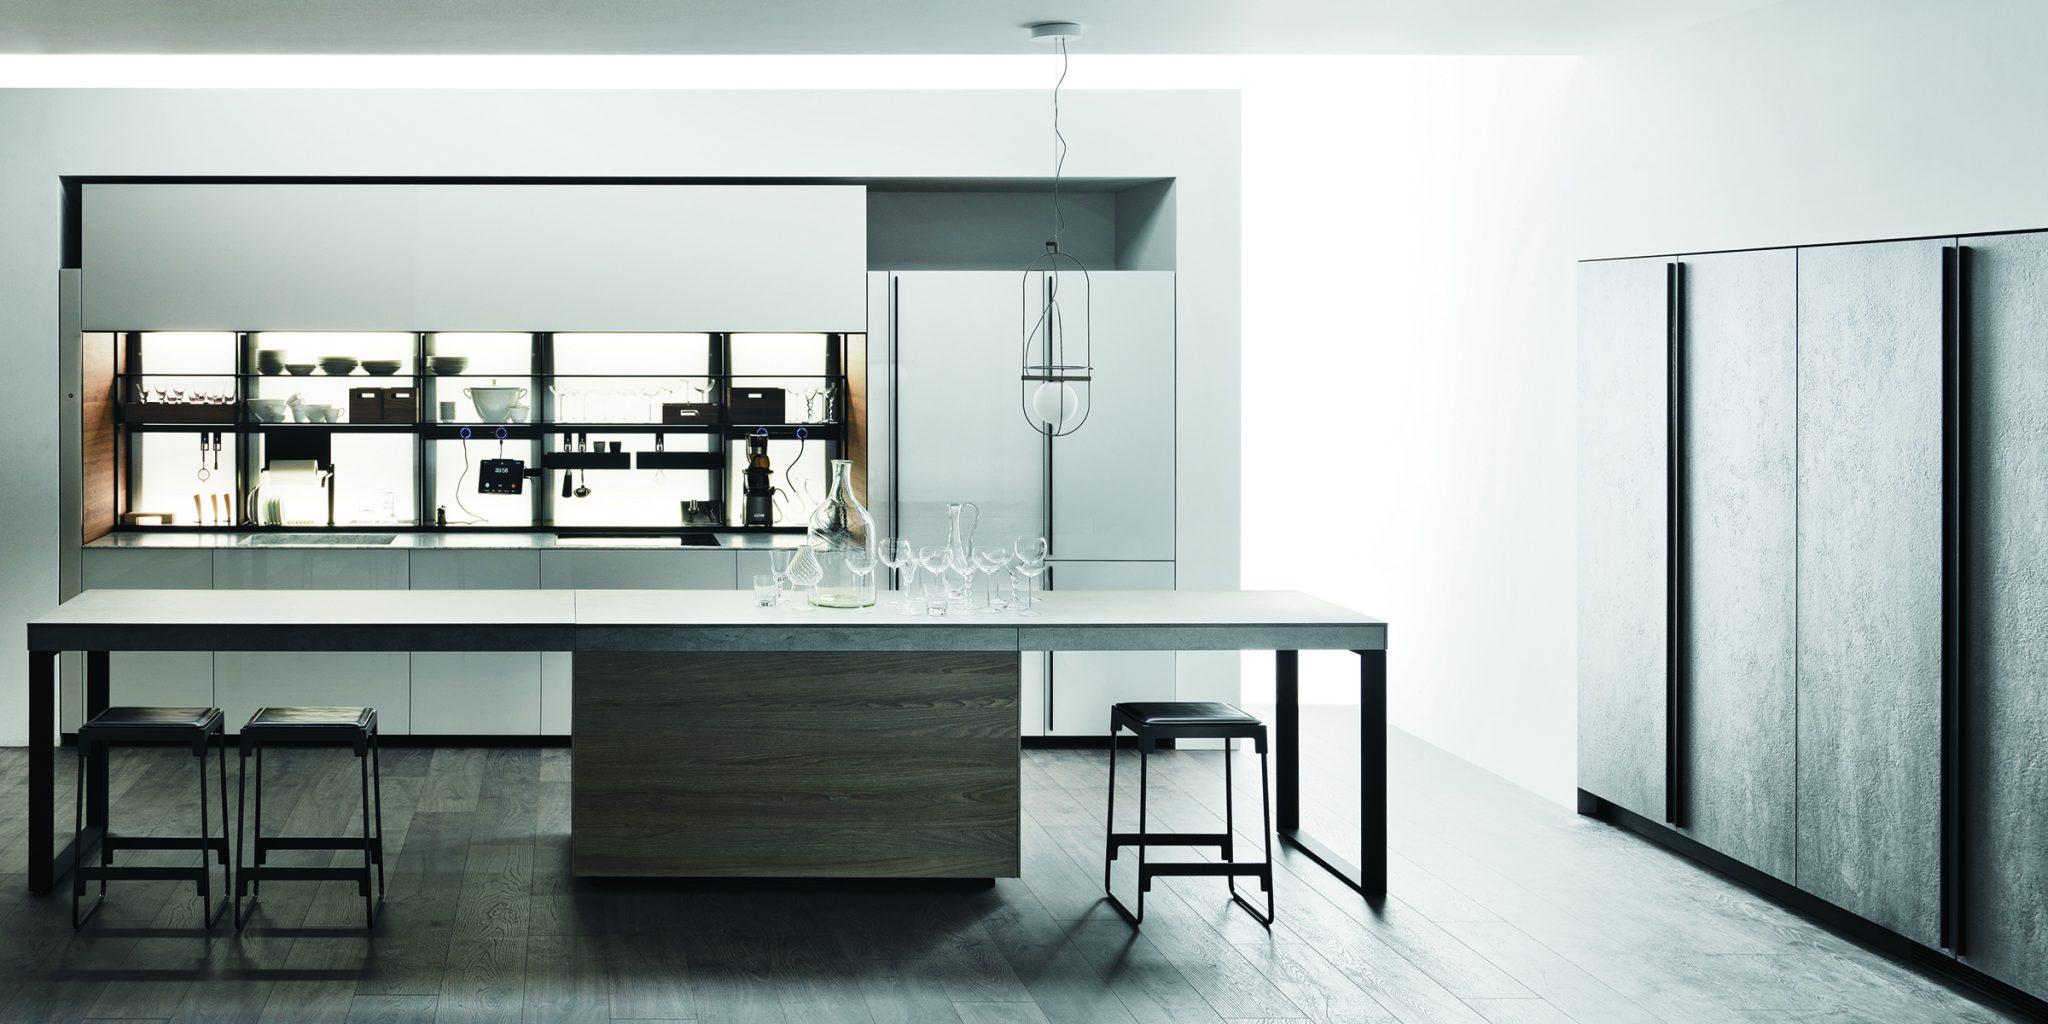 Impressie keukenarchitectuur